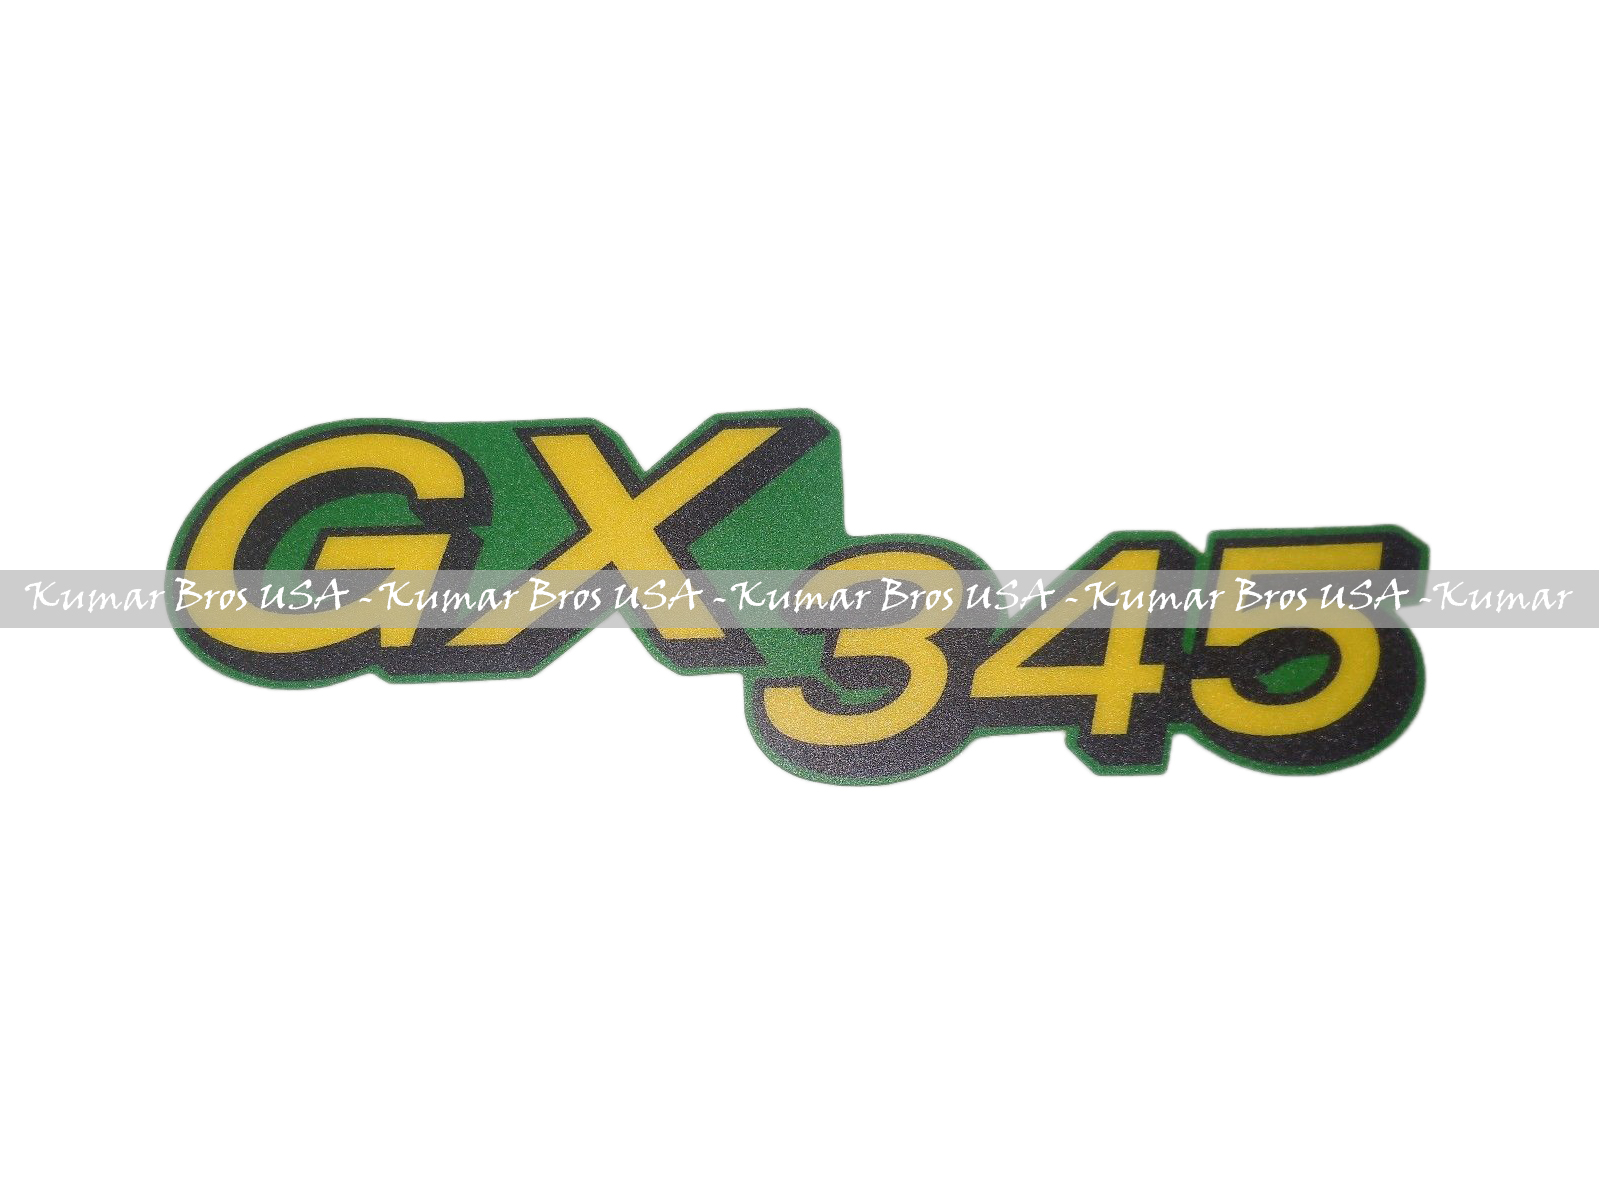 Kumar Bros USA Lower Hood Set of 2 Decals Replaces M145998 Fits John Deere GX345